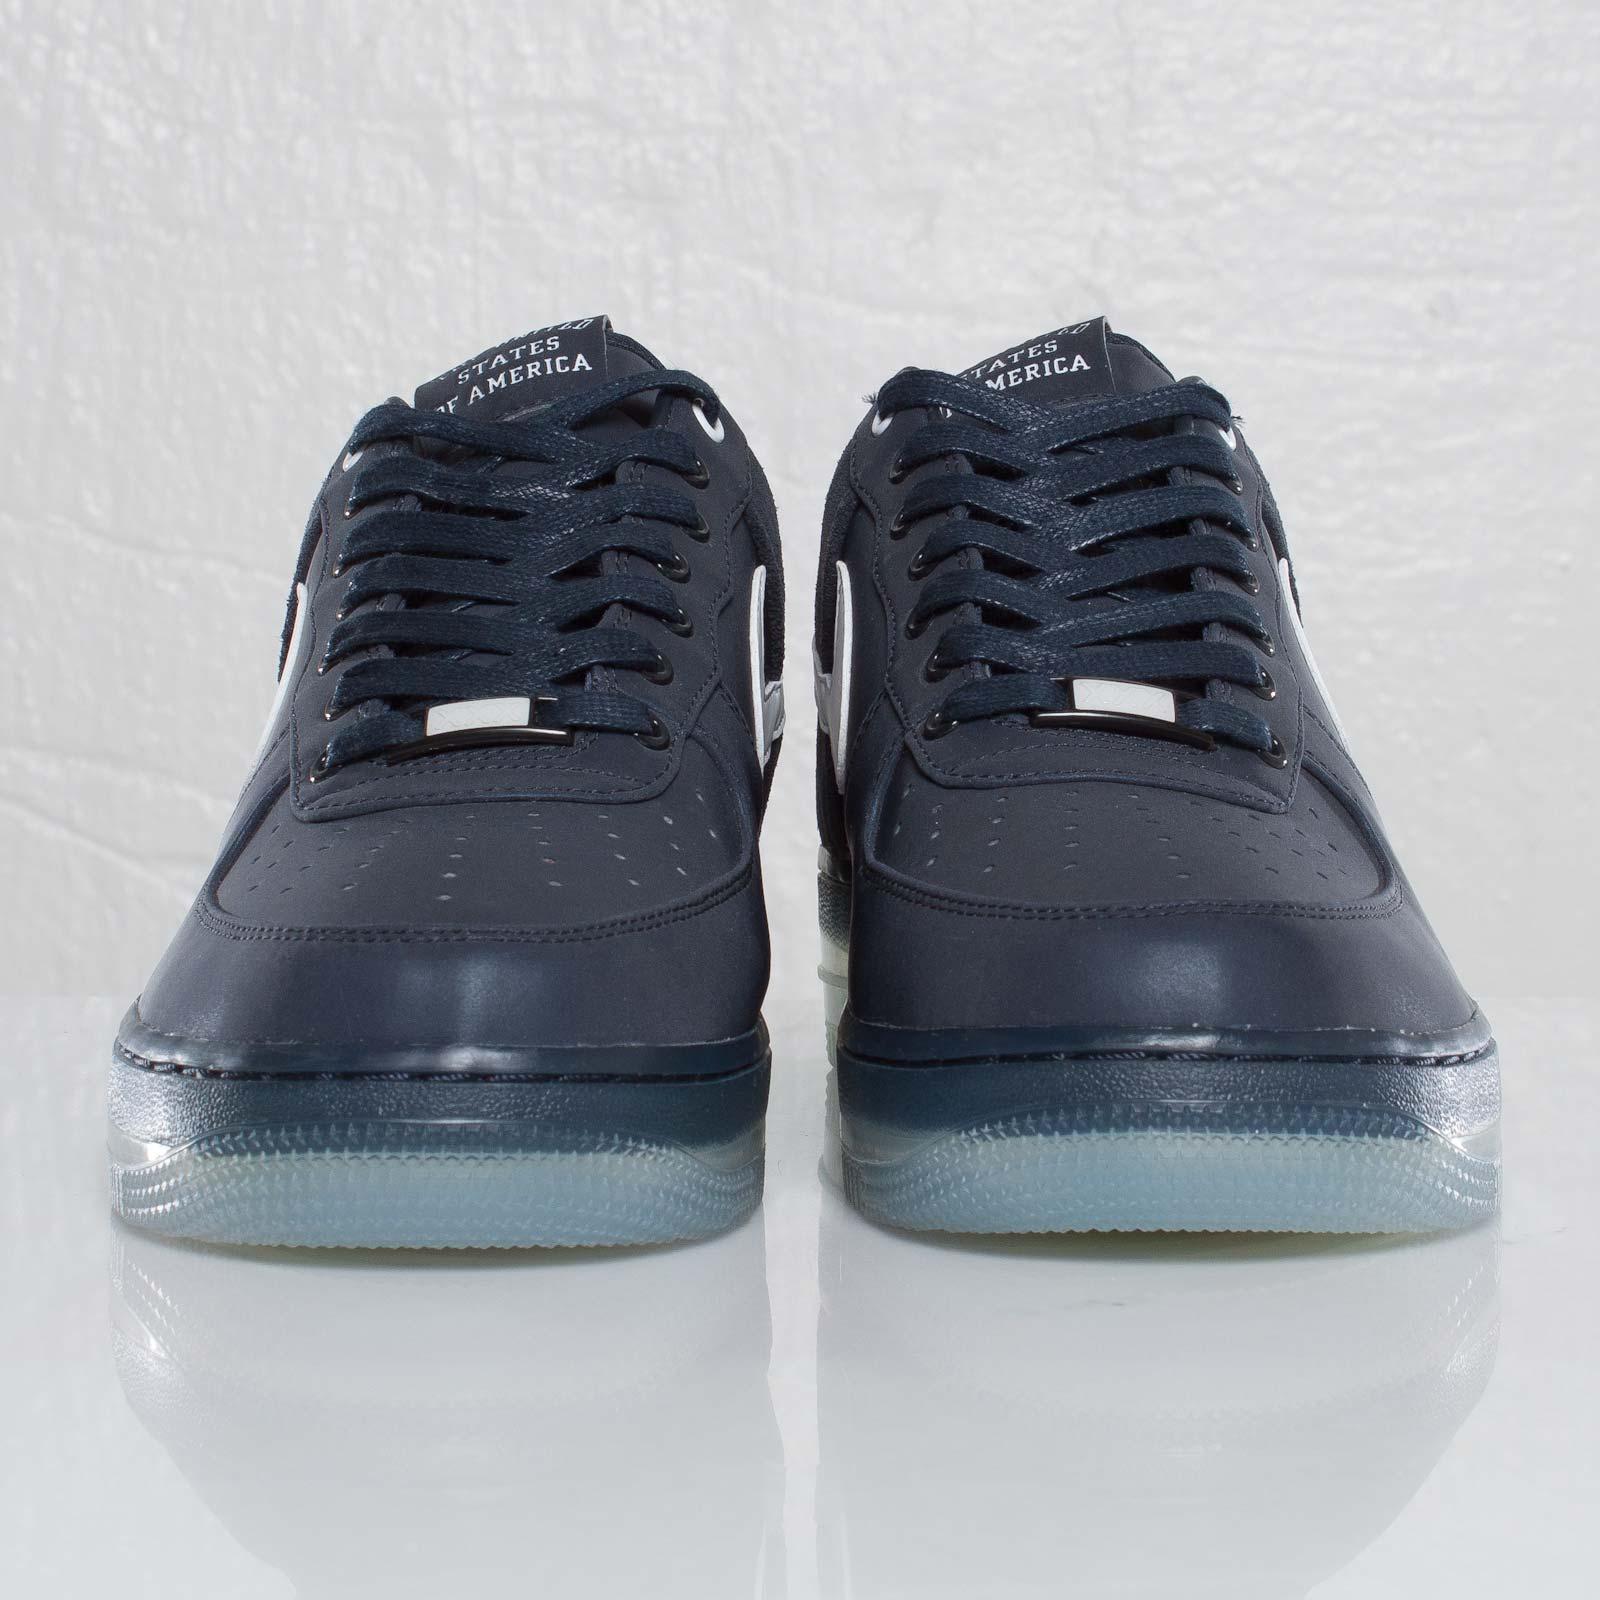 Nike Air Force 1 Low Max Air NRG 110717 Sneakersnstuff